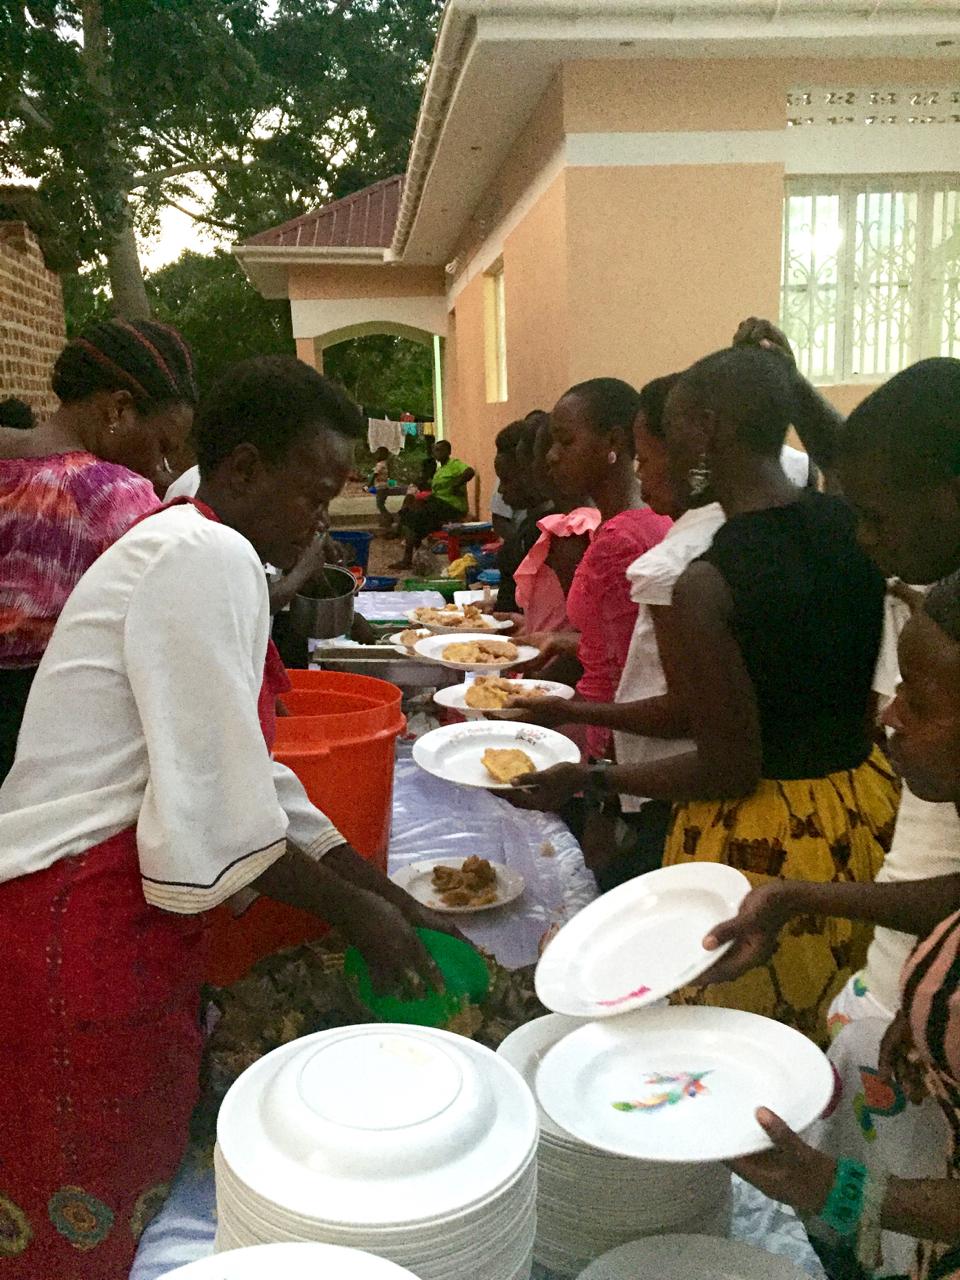 Bombo Pentacostal Church ladies serve the feast they prepared!